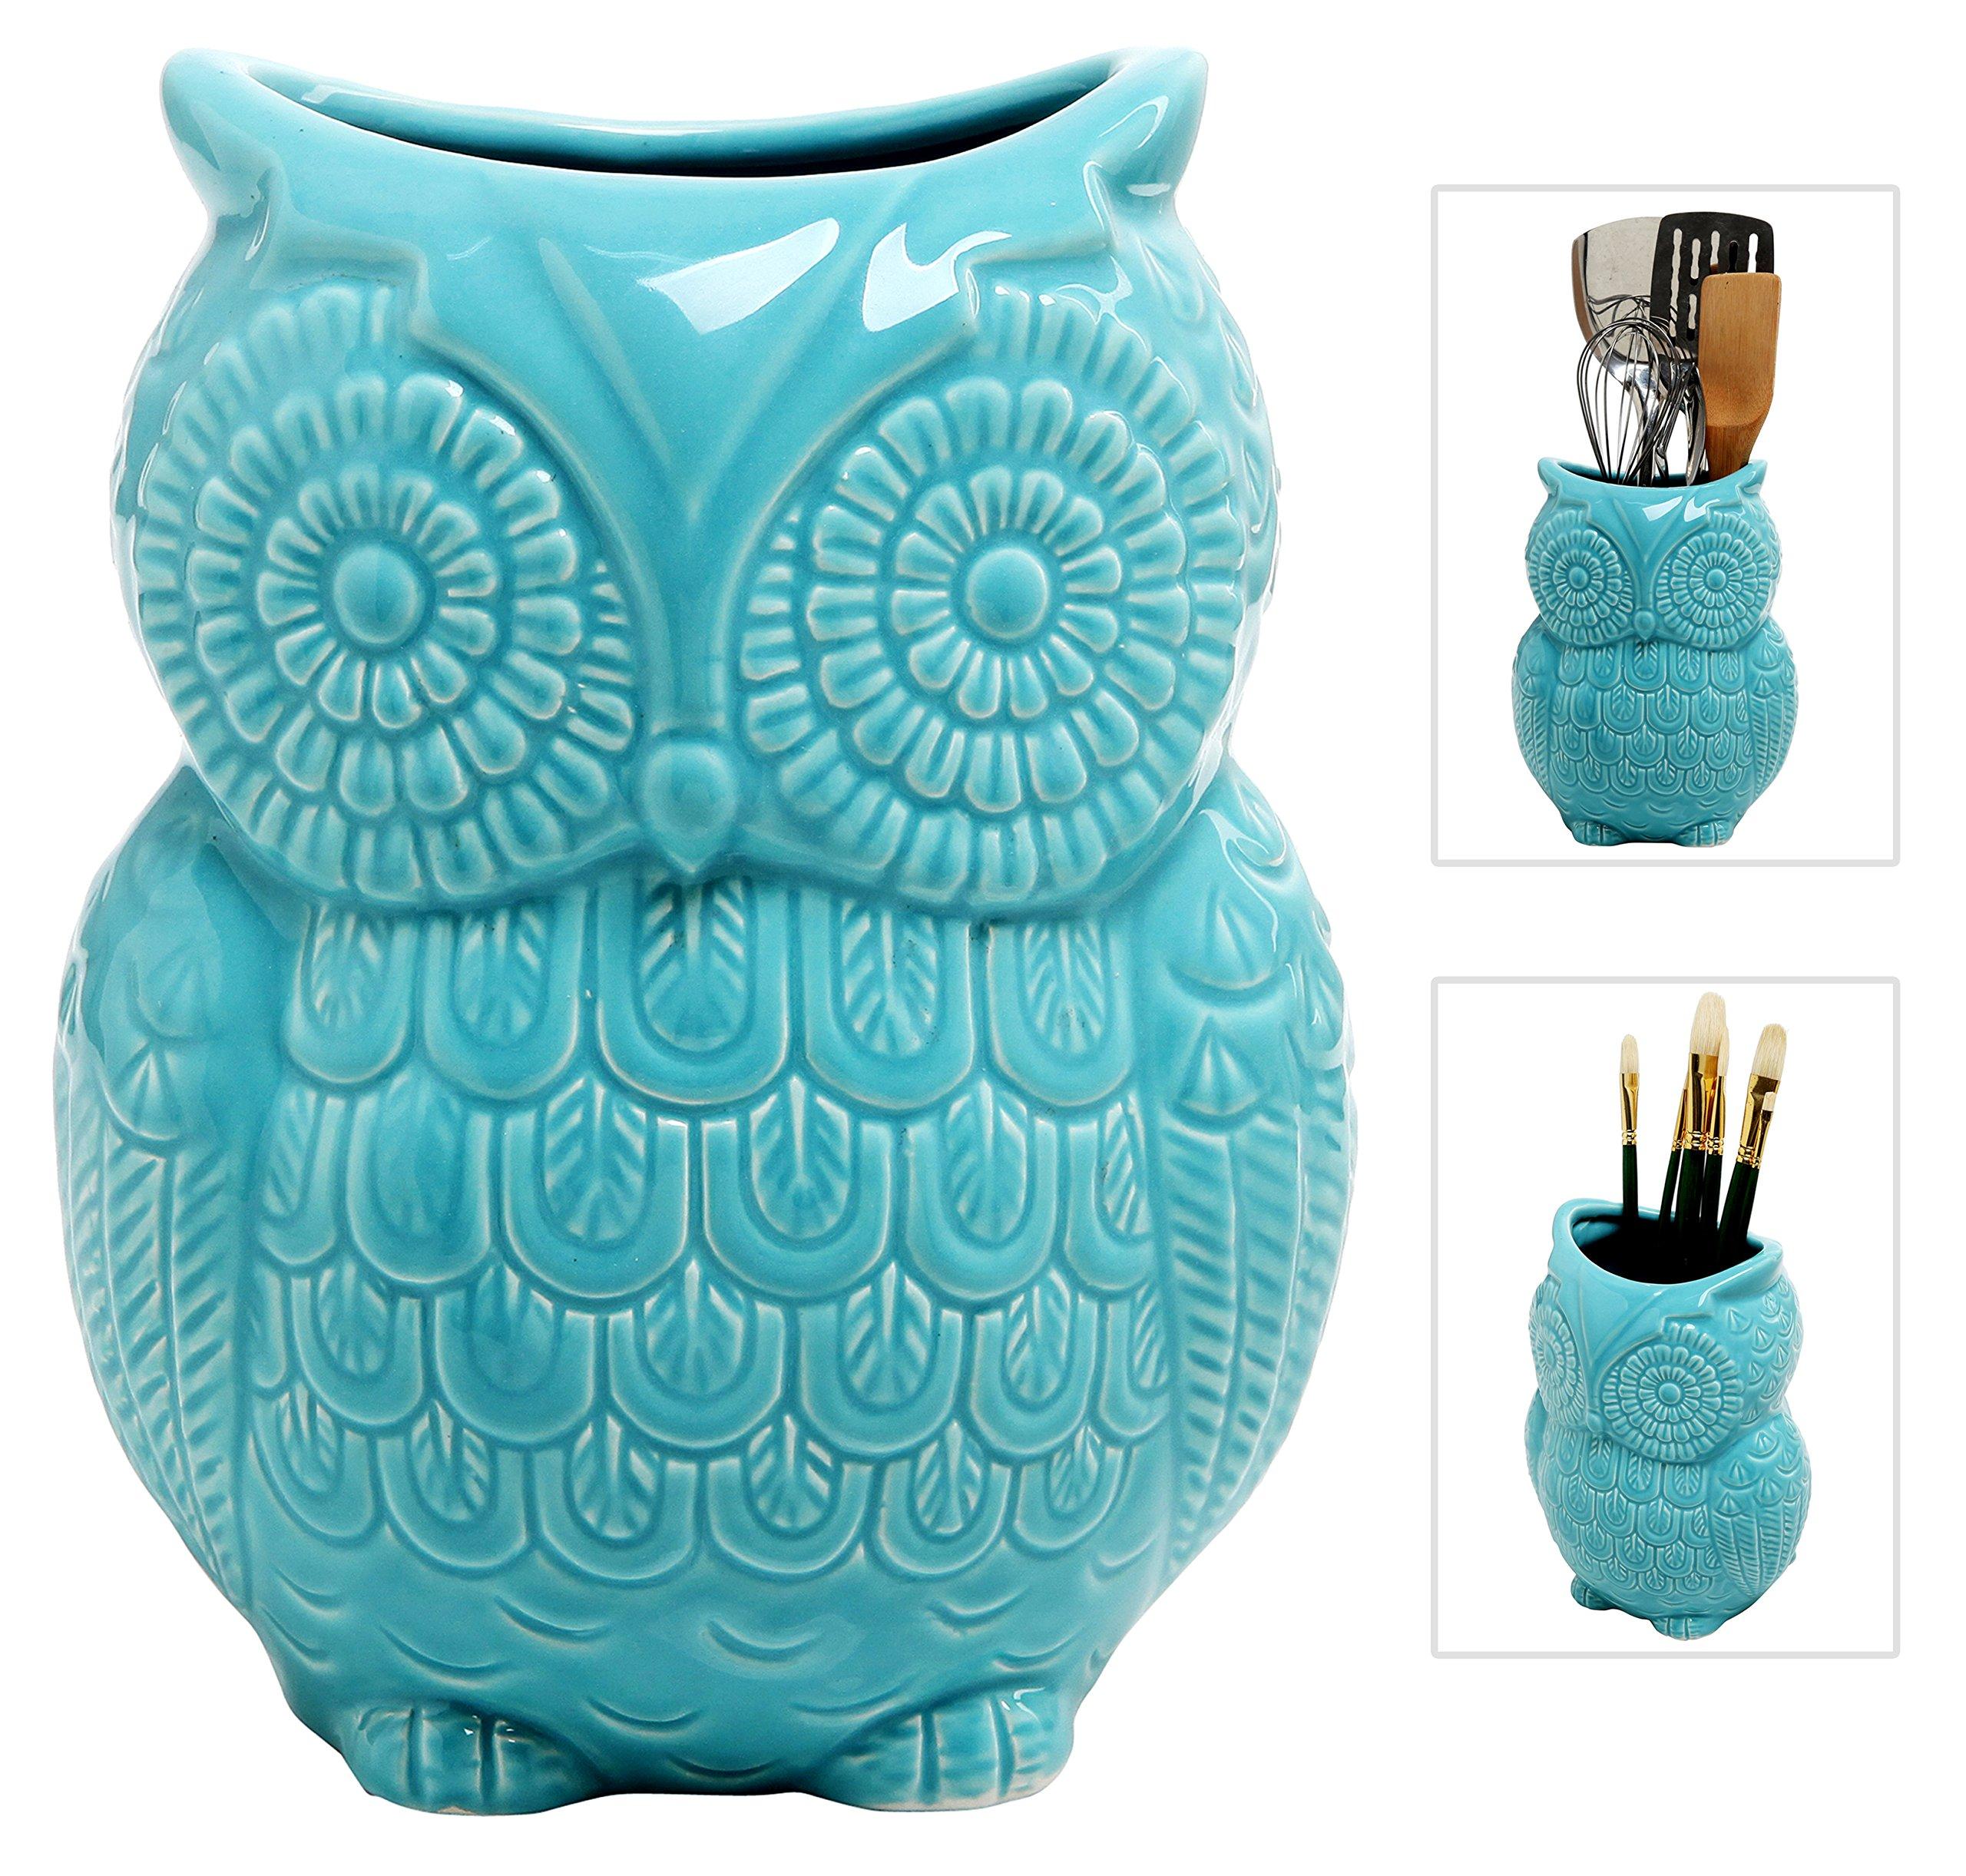 MyGift Large Owl Design Ceramic Cooking Utensil Holder, Kitchen Storage Crock, Aqua Blue by MyGift